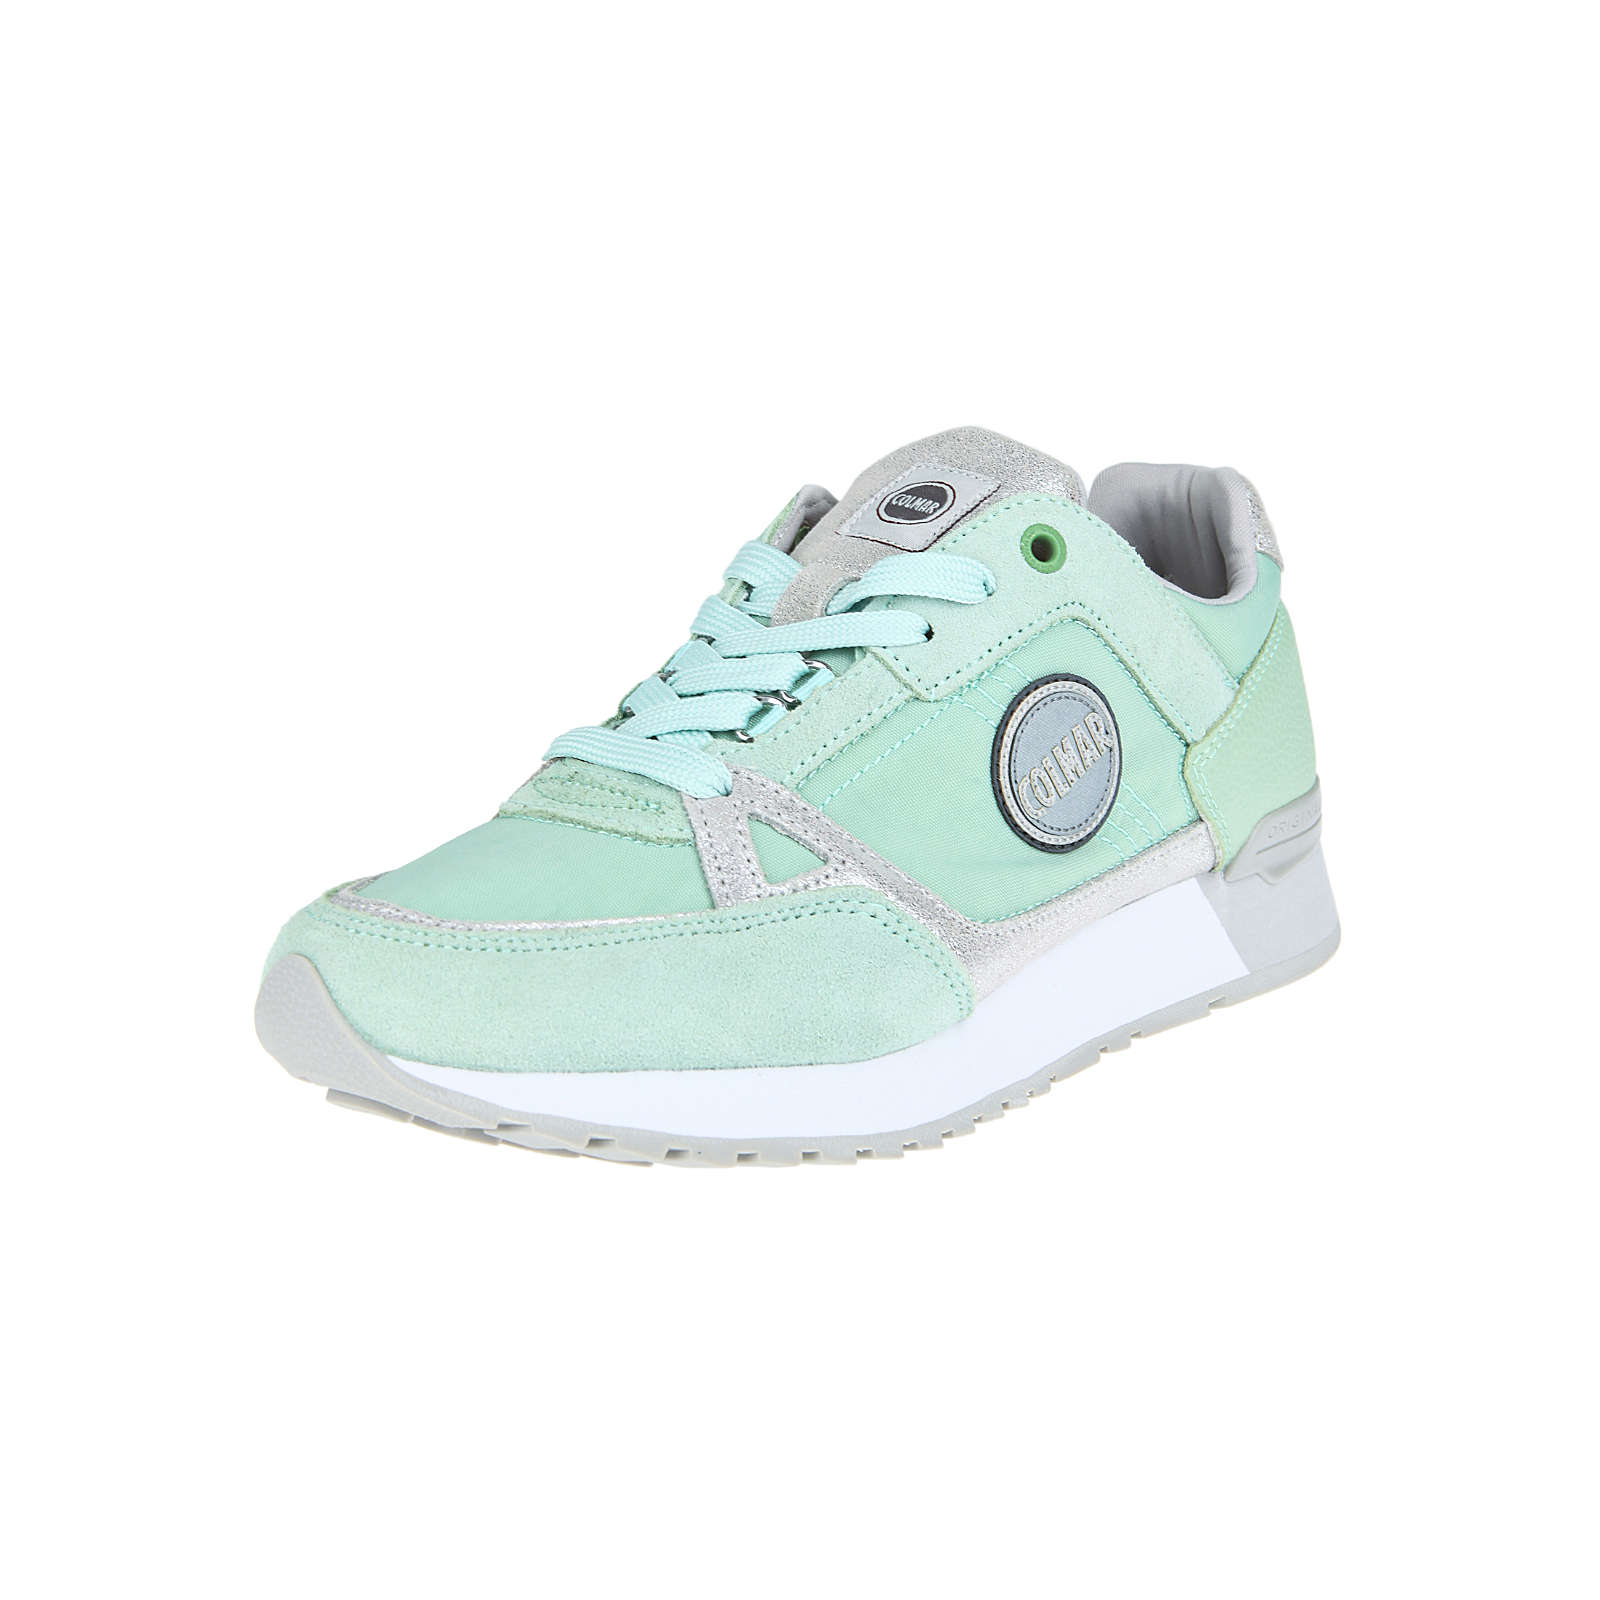 COLMAR Sneaker TRAVIS SUPREME COLORS Sneakers Low mint Damen Gr. 37